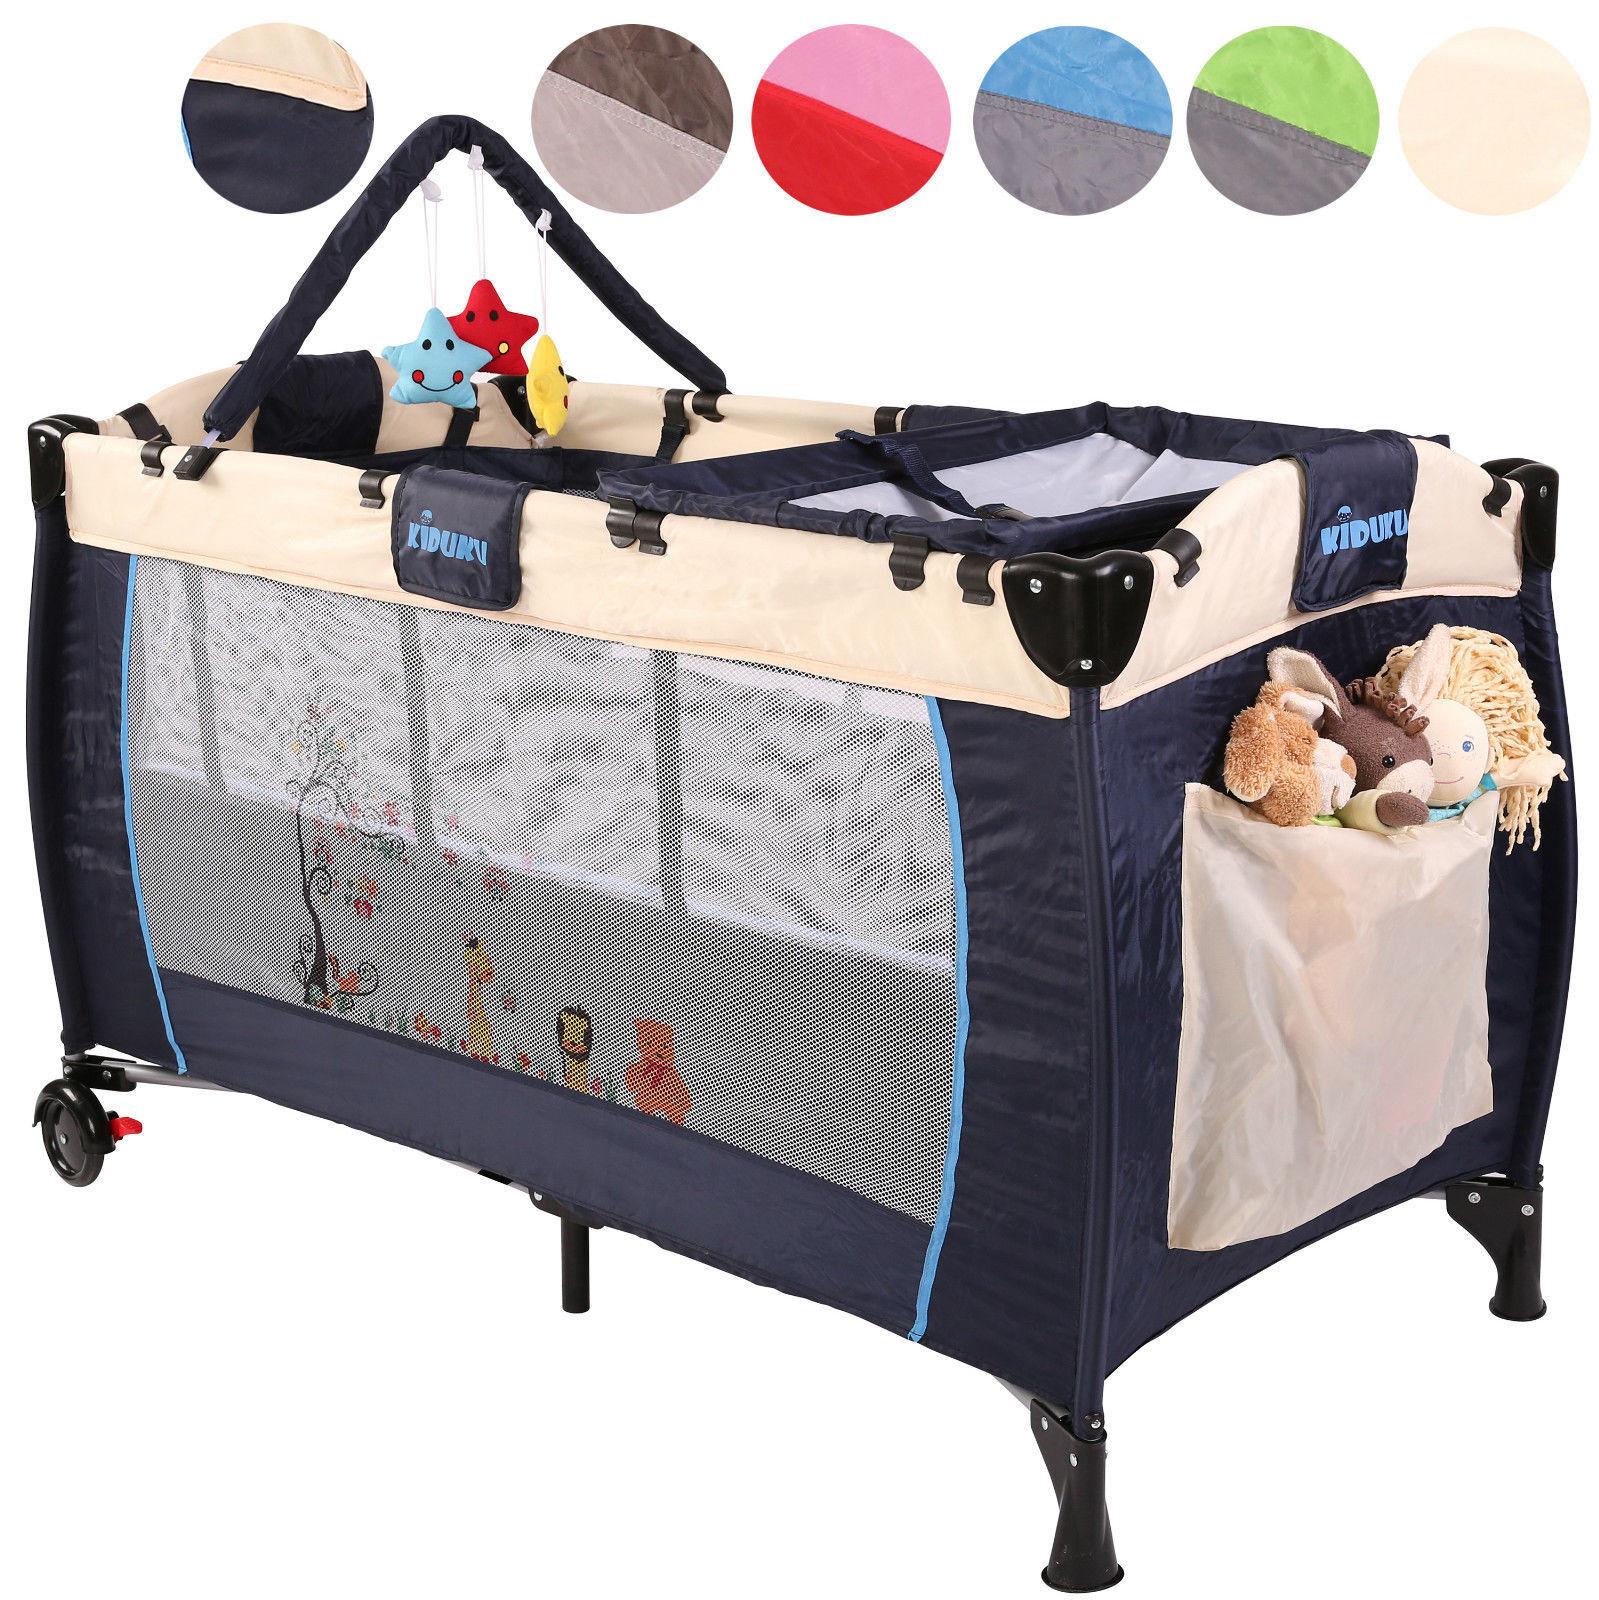 Babybett Baby Reisebett Kinderreisebett Kinderbett Klappbett Laufstall 6 Farben